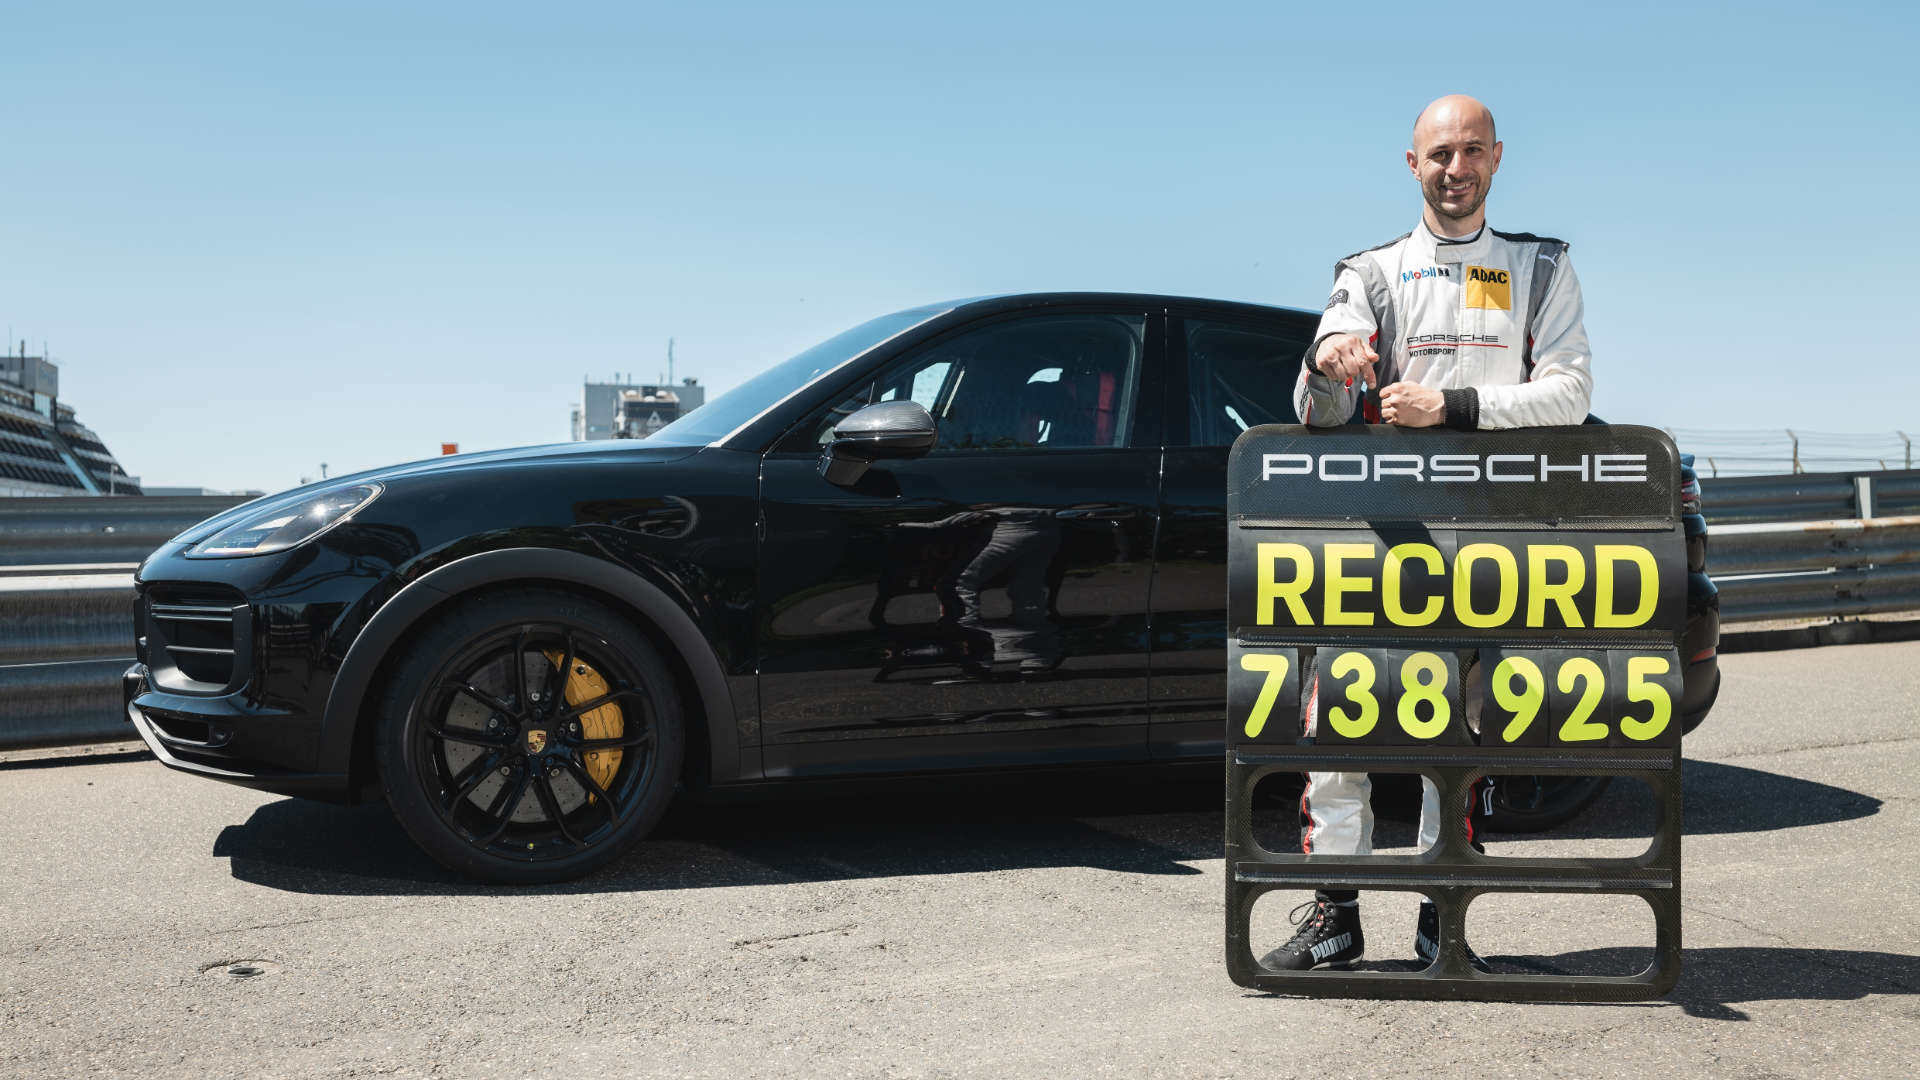 Porsche Nürburgring Rekord Lars Kern